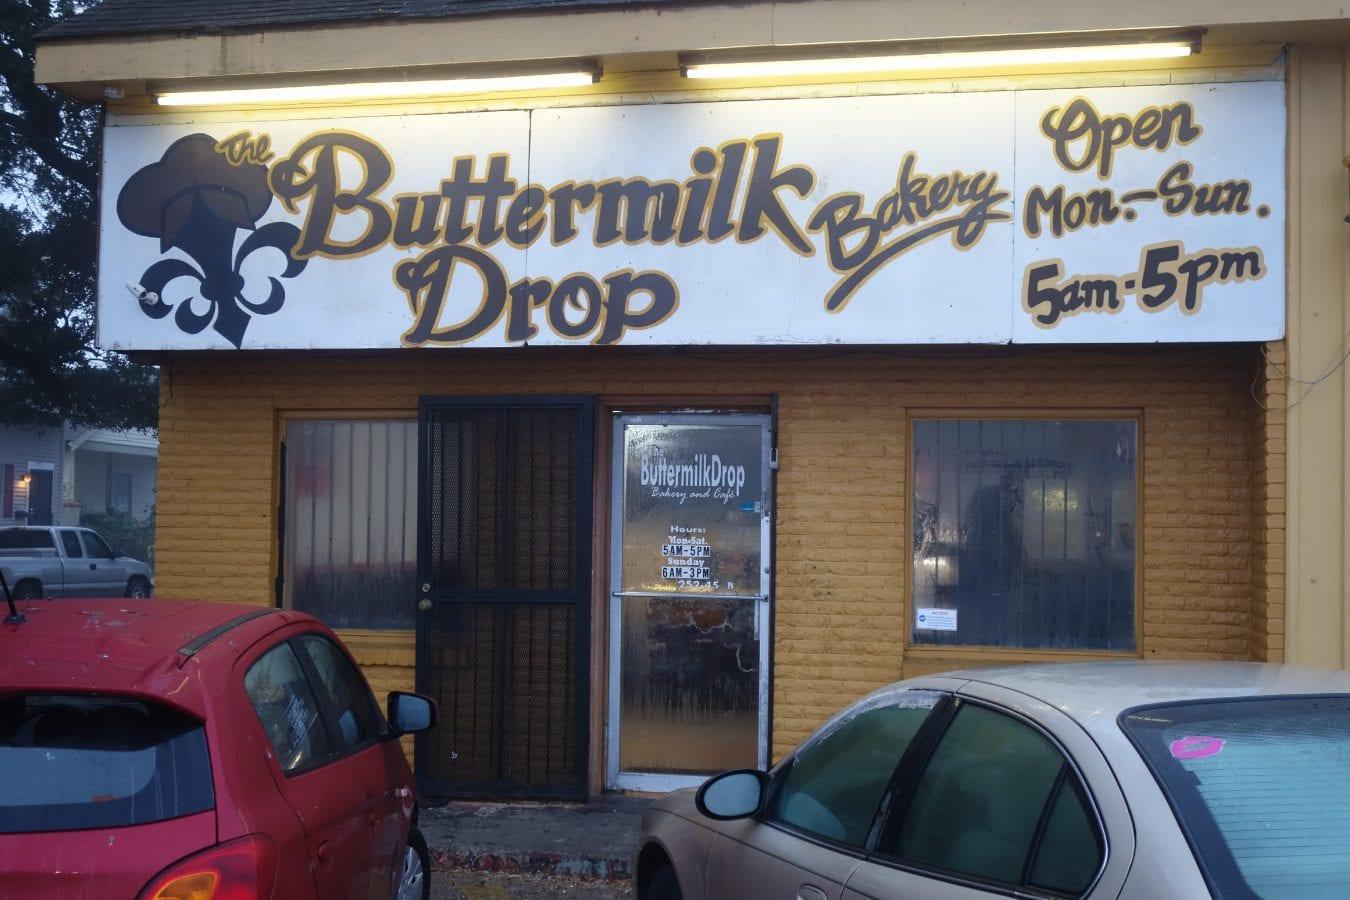 Buttermilk Drop Bakery Cafe New Orleans La